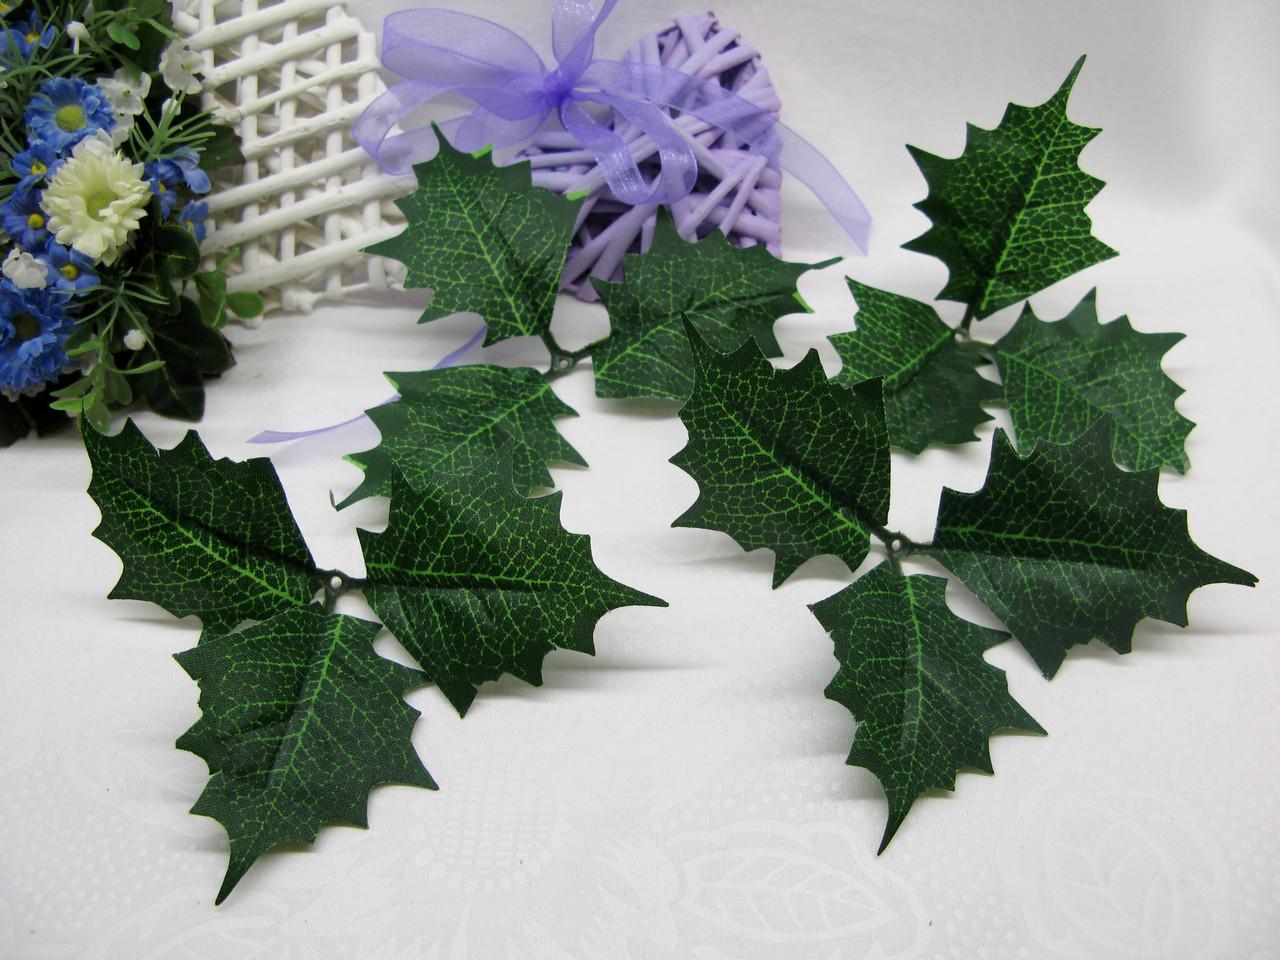 Лист падуба (без ягод) зеленый трилистник 20 грн набор (10 шт)